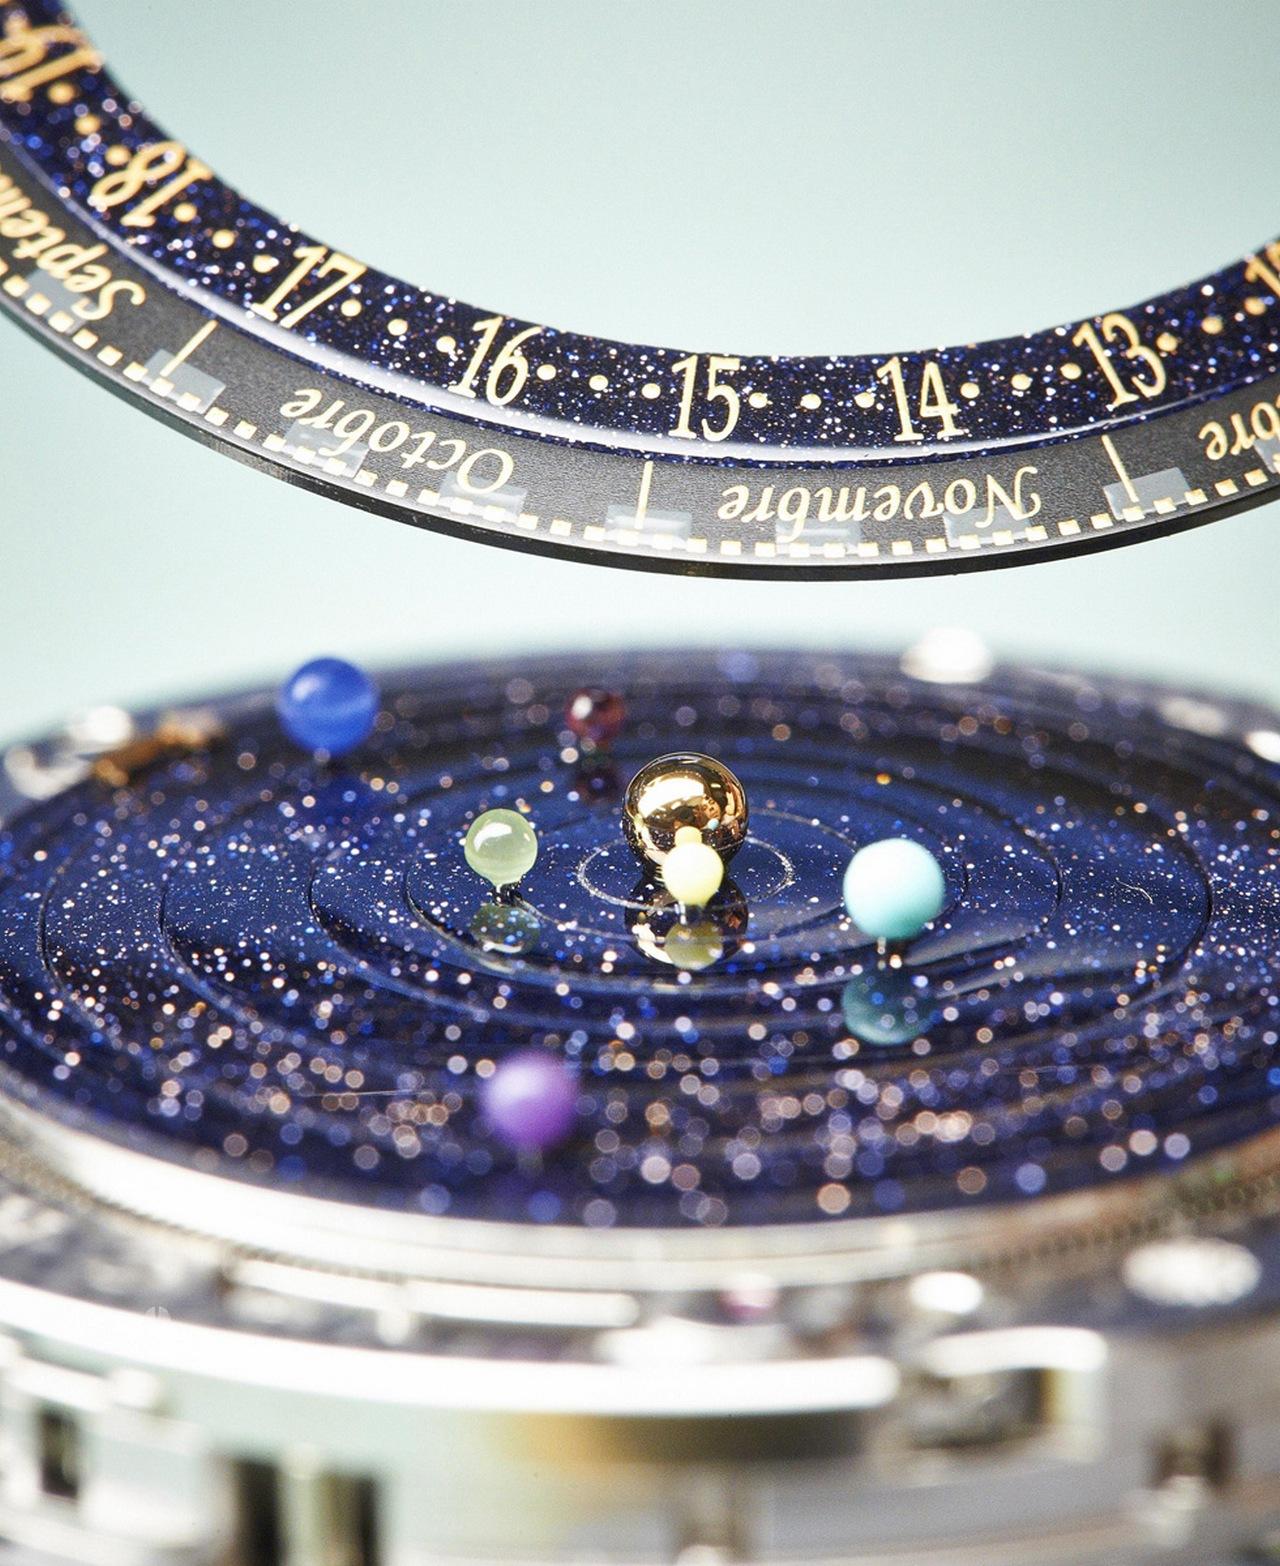 van-cleef-arpels-midnight-planetarium-poetic-complication-prezzo-price_0-100_2